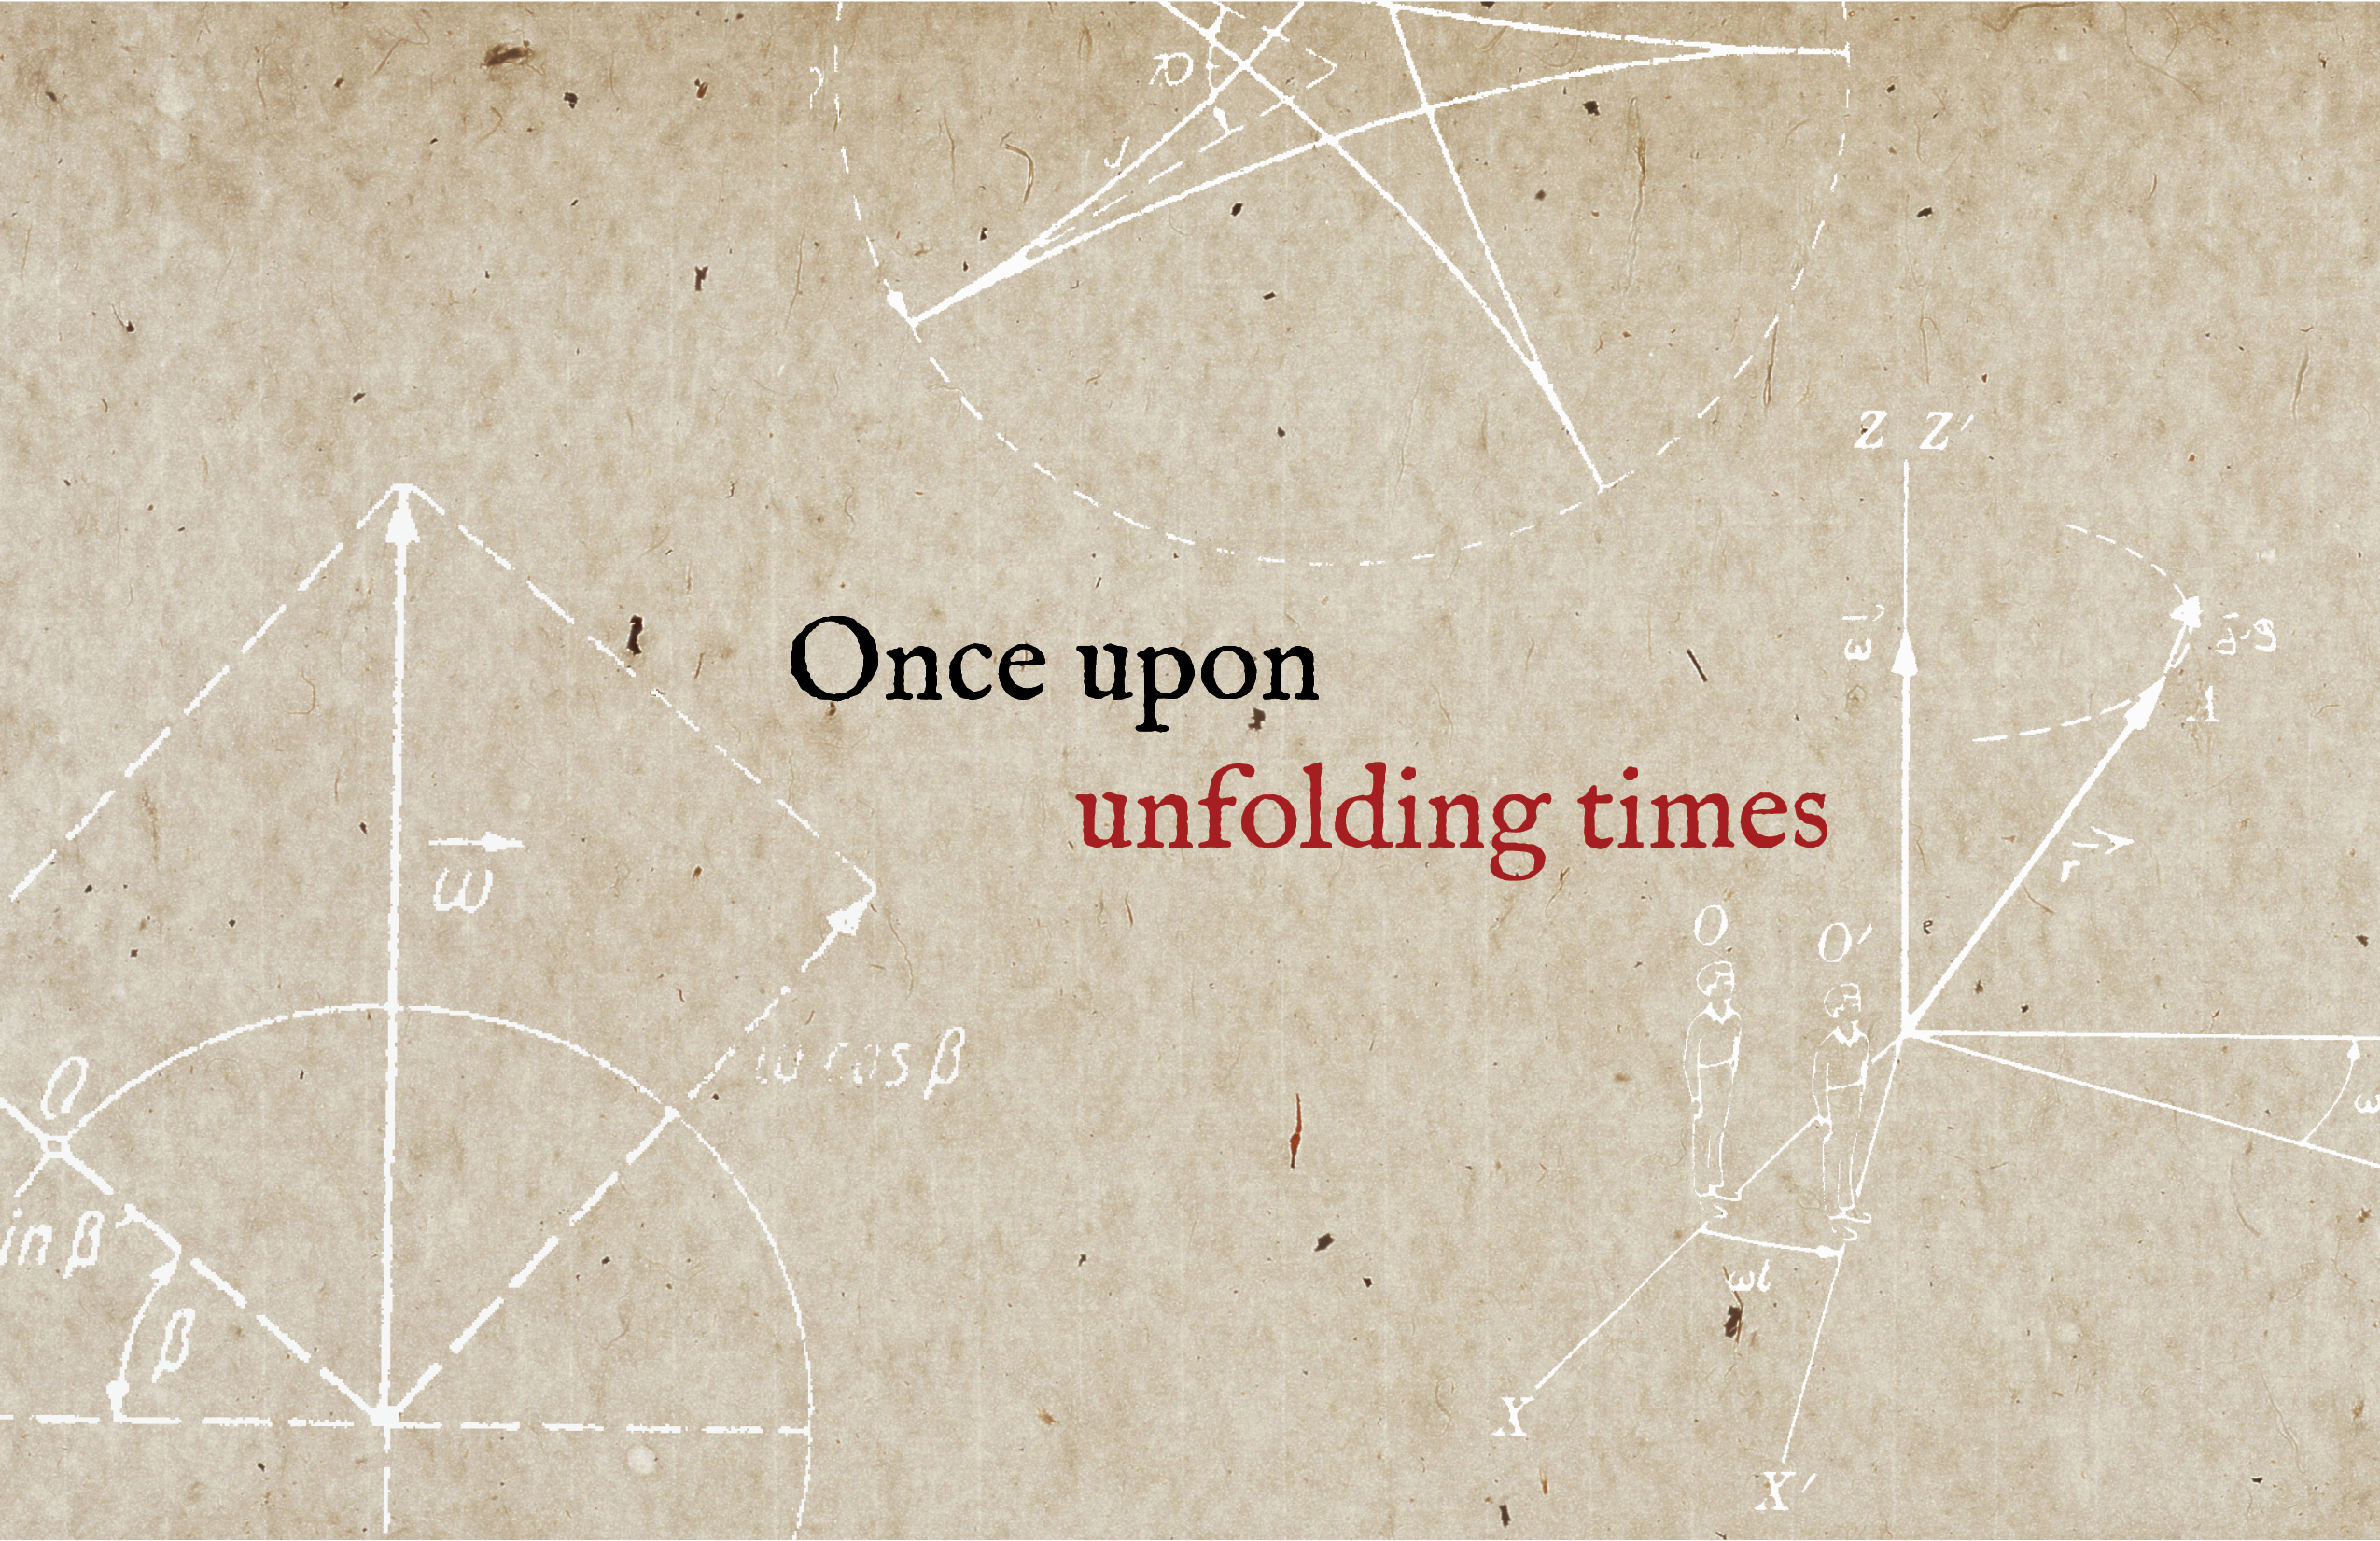 Once upon_image